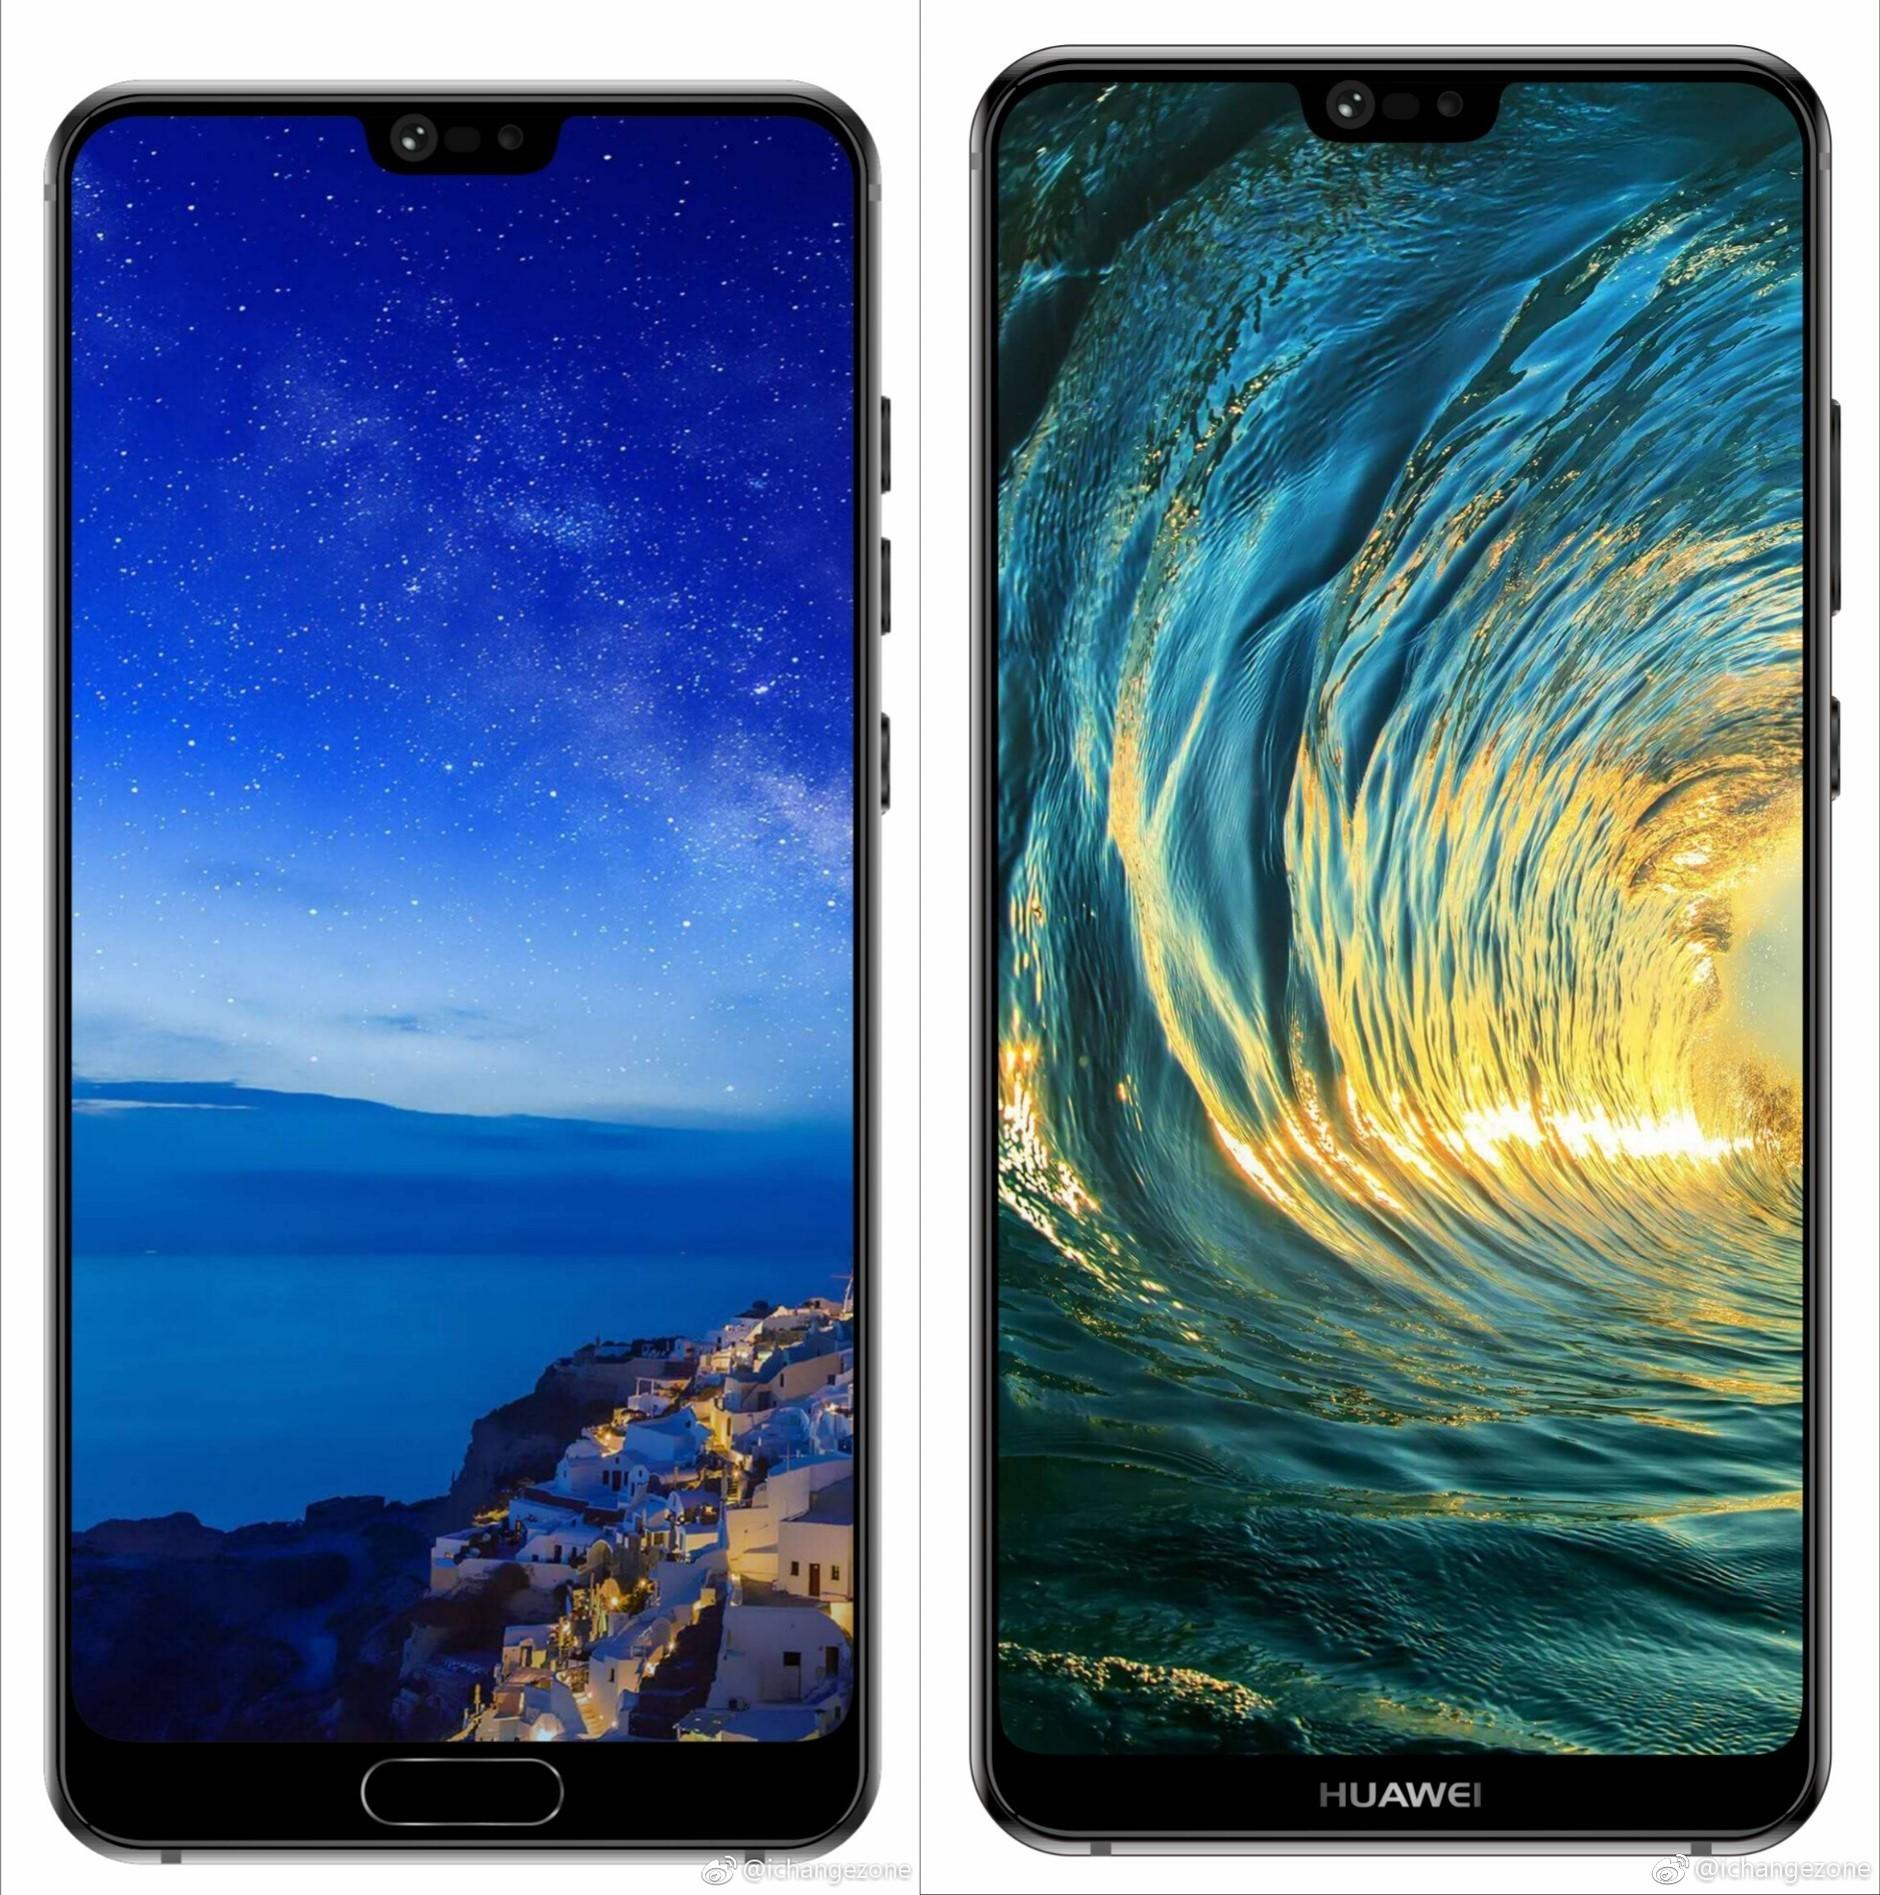 Huawei P20 and P20 Plus leak